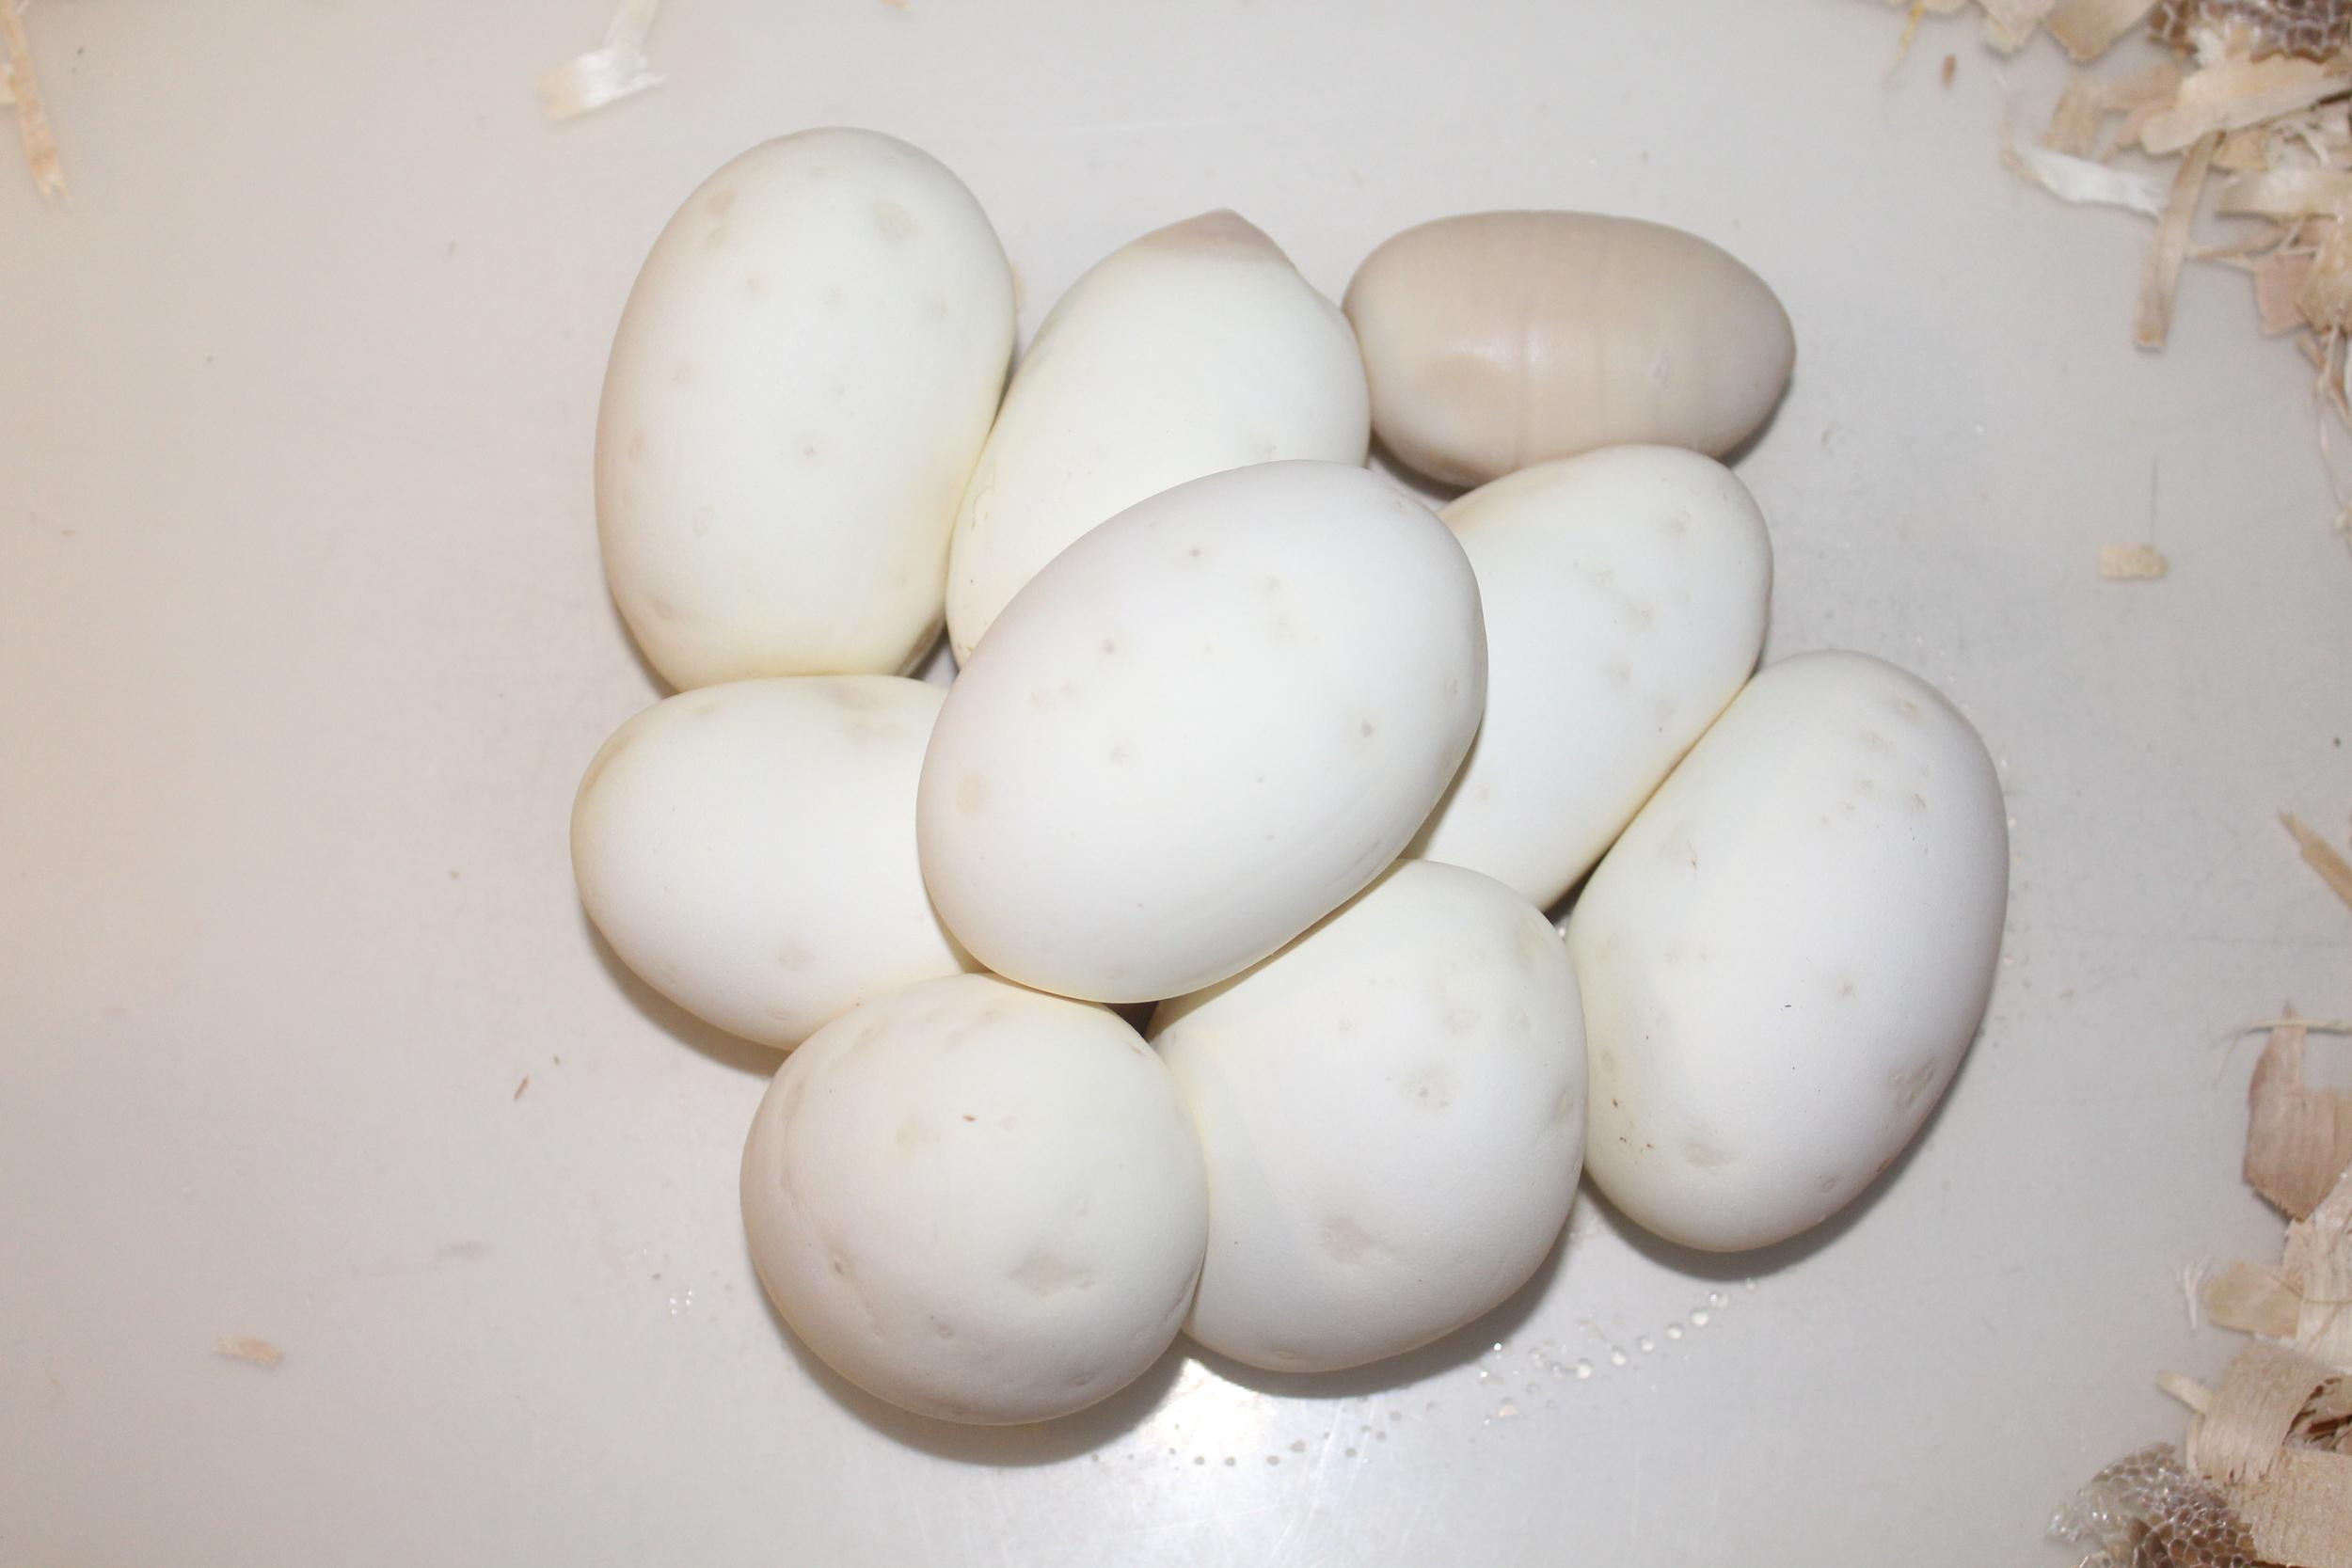 8 Good eggs and one slug